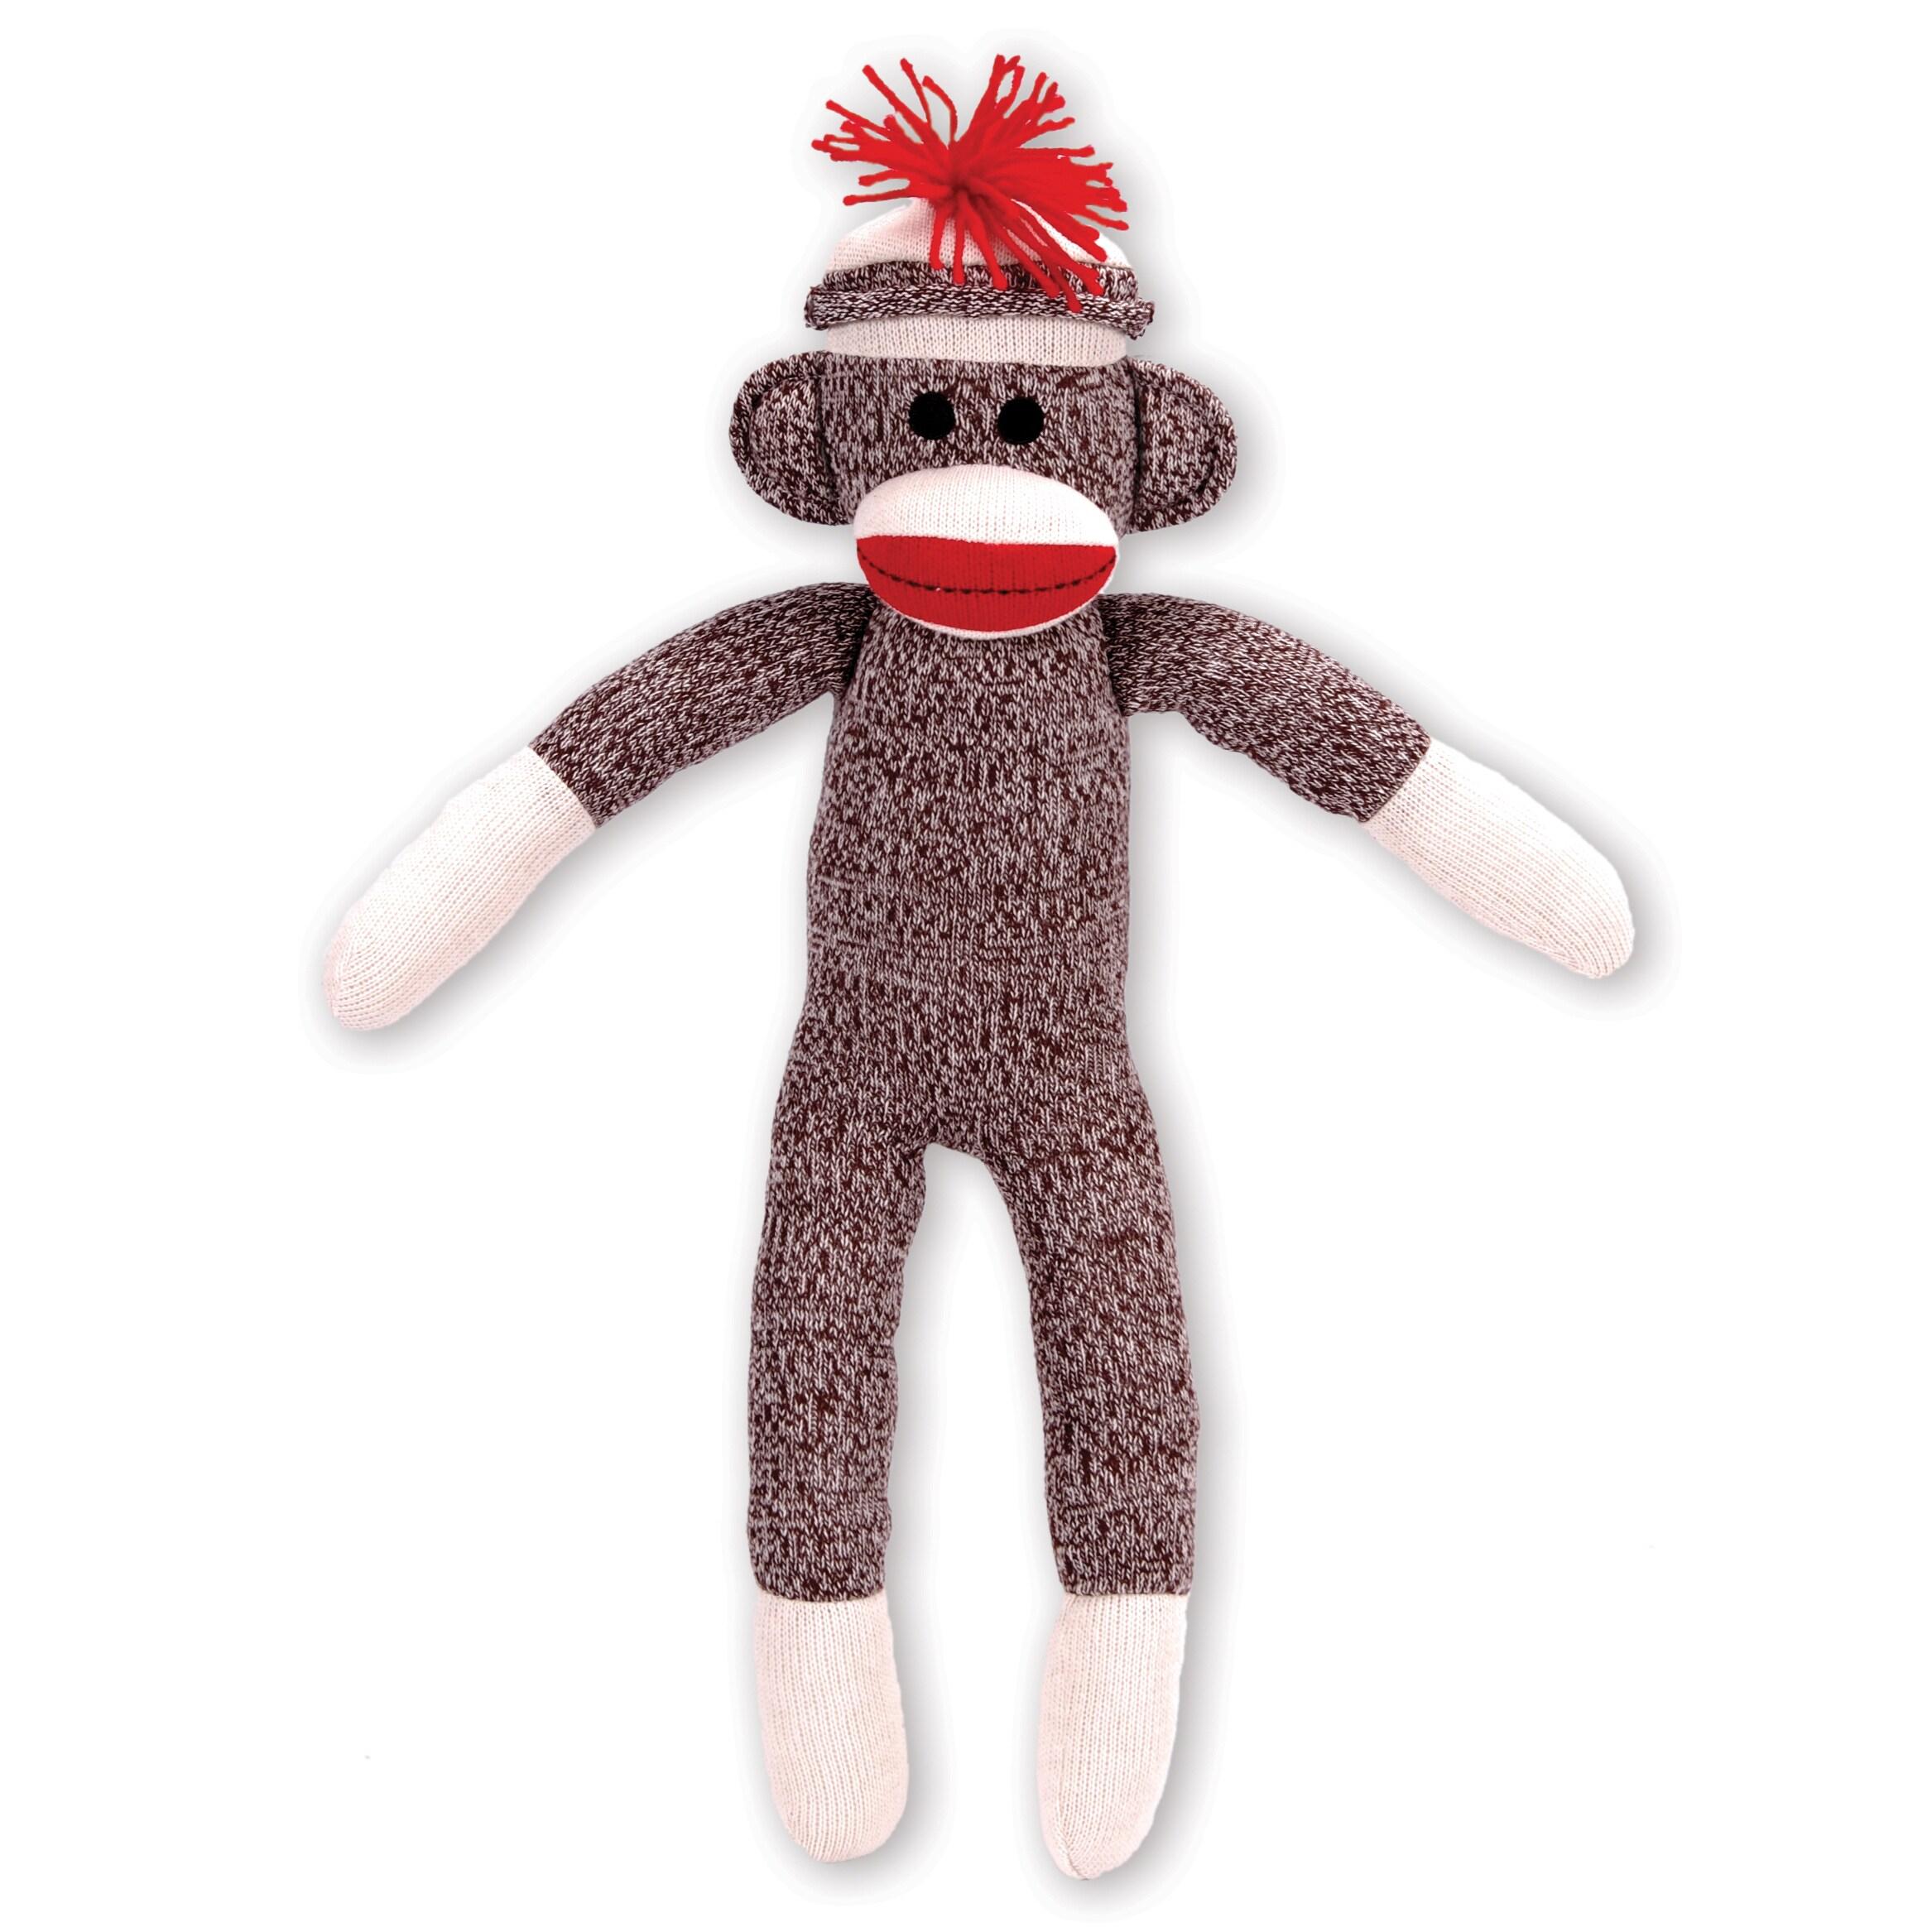 Schylling Sock Monkey Stuffed Animal (G019649223145), Red